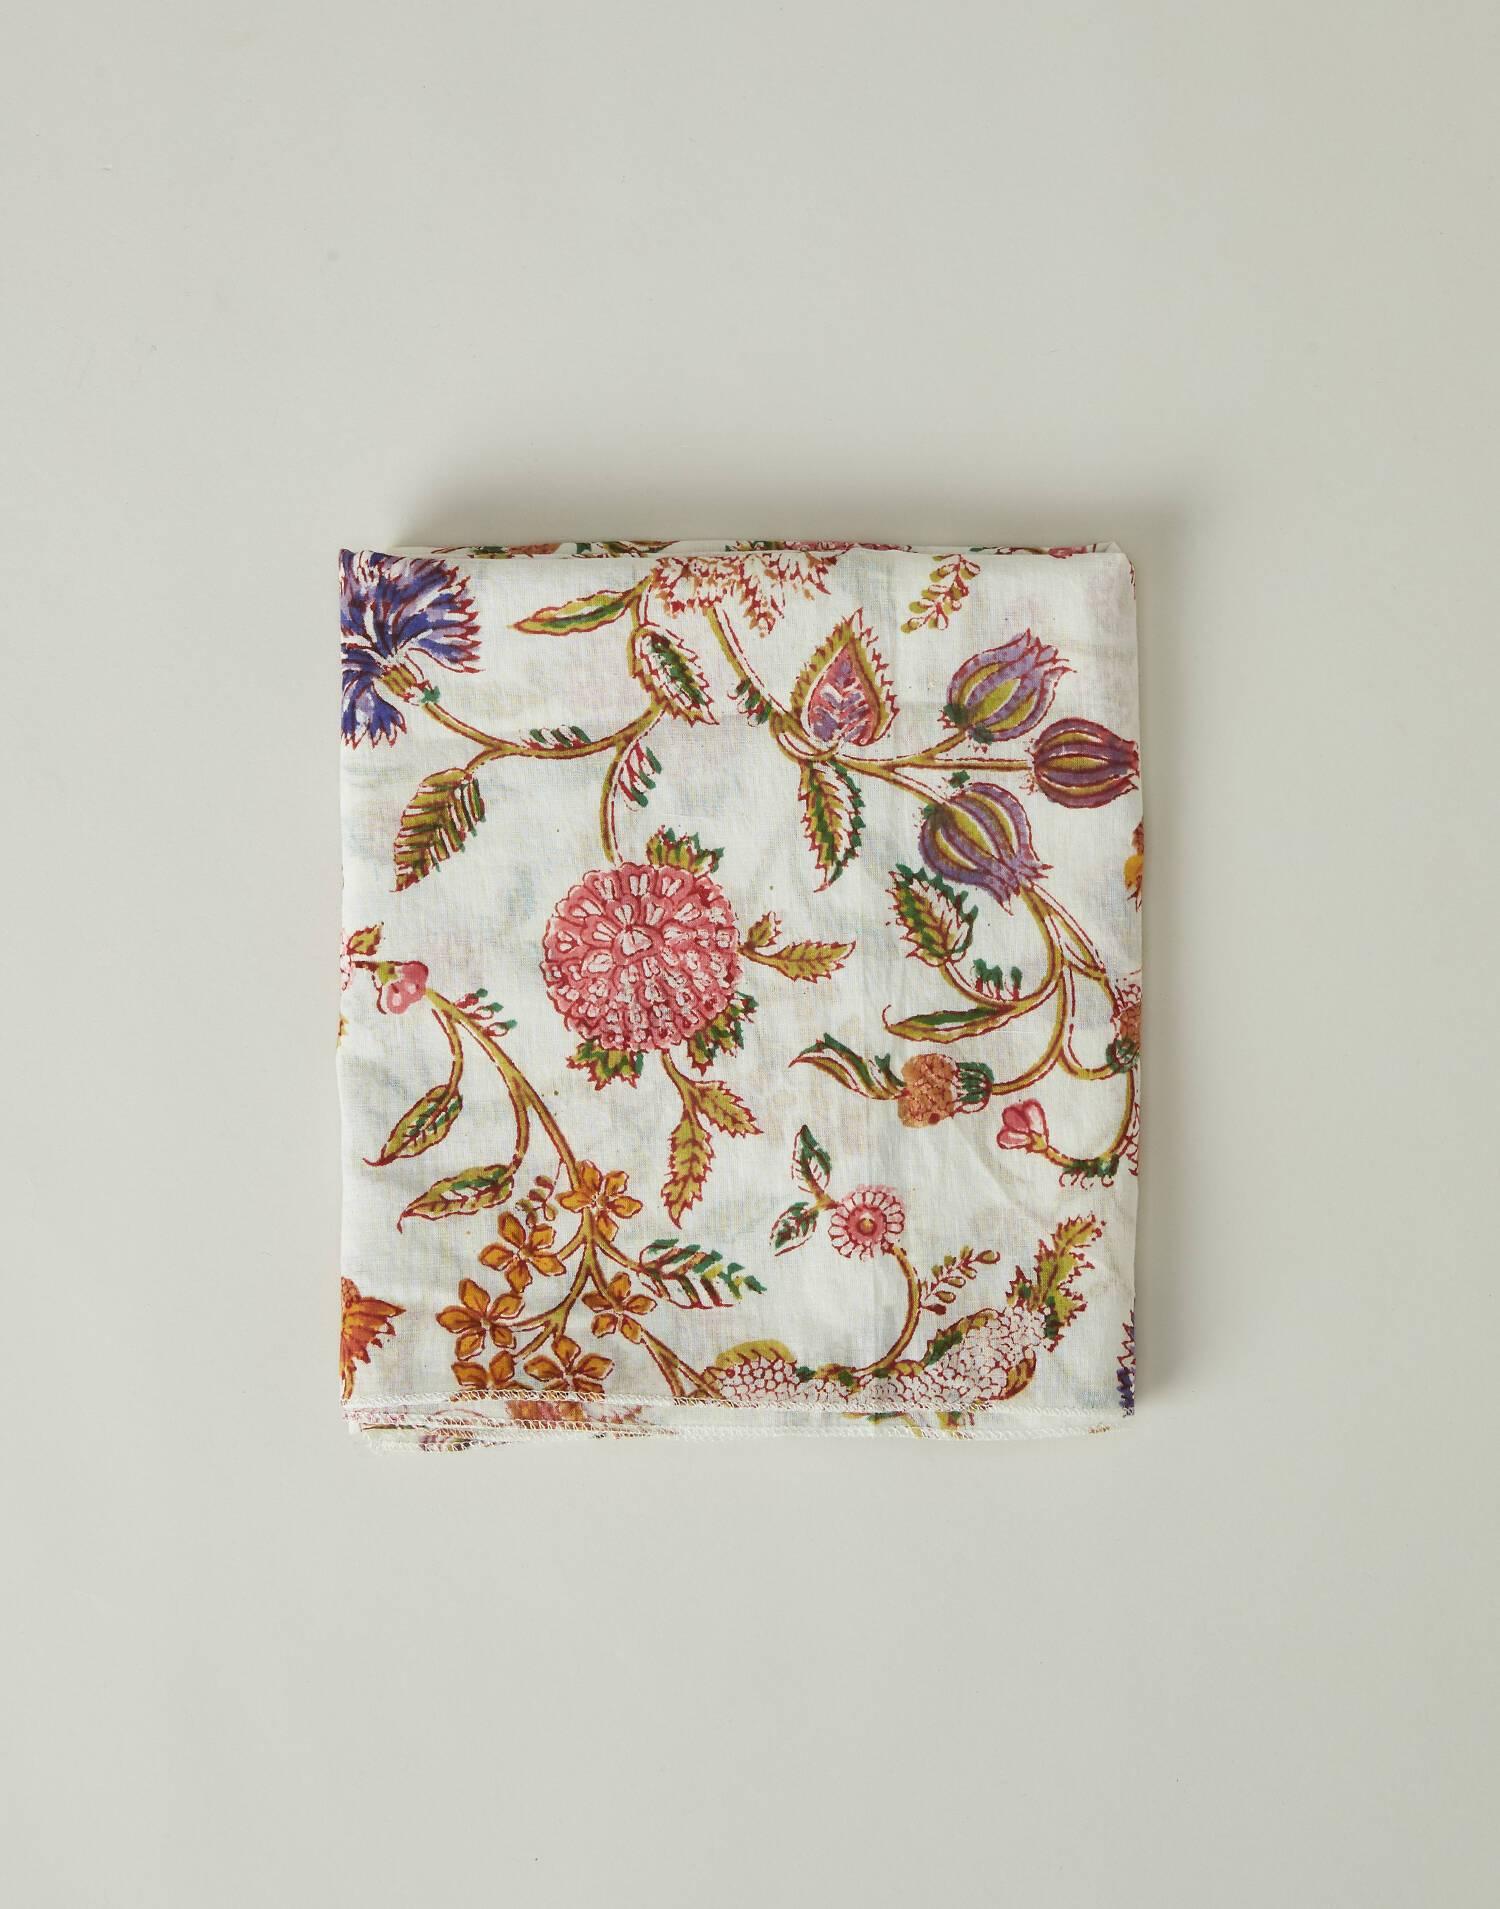 Fular print flores indias